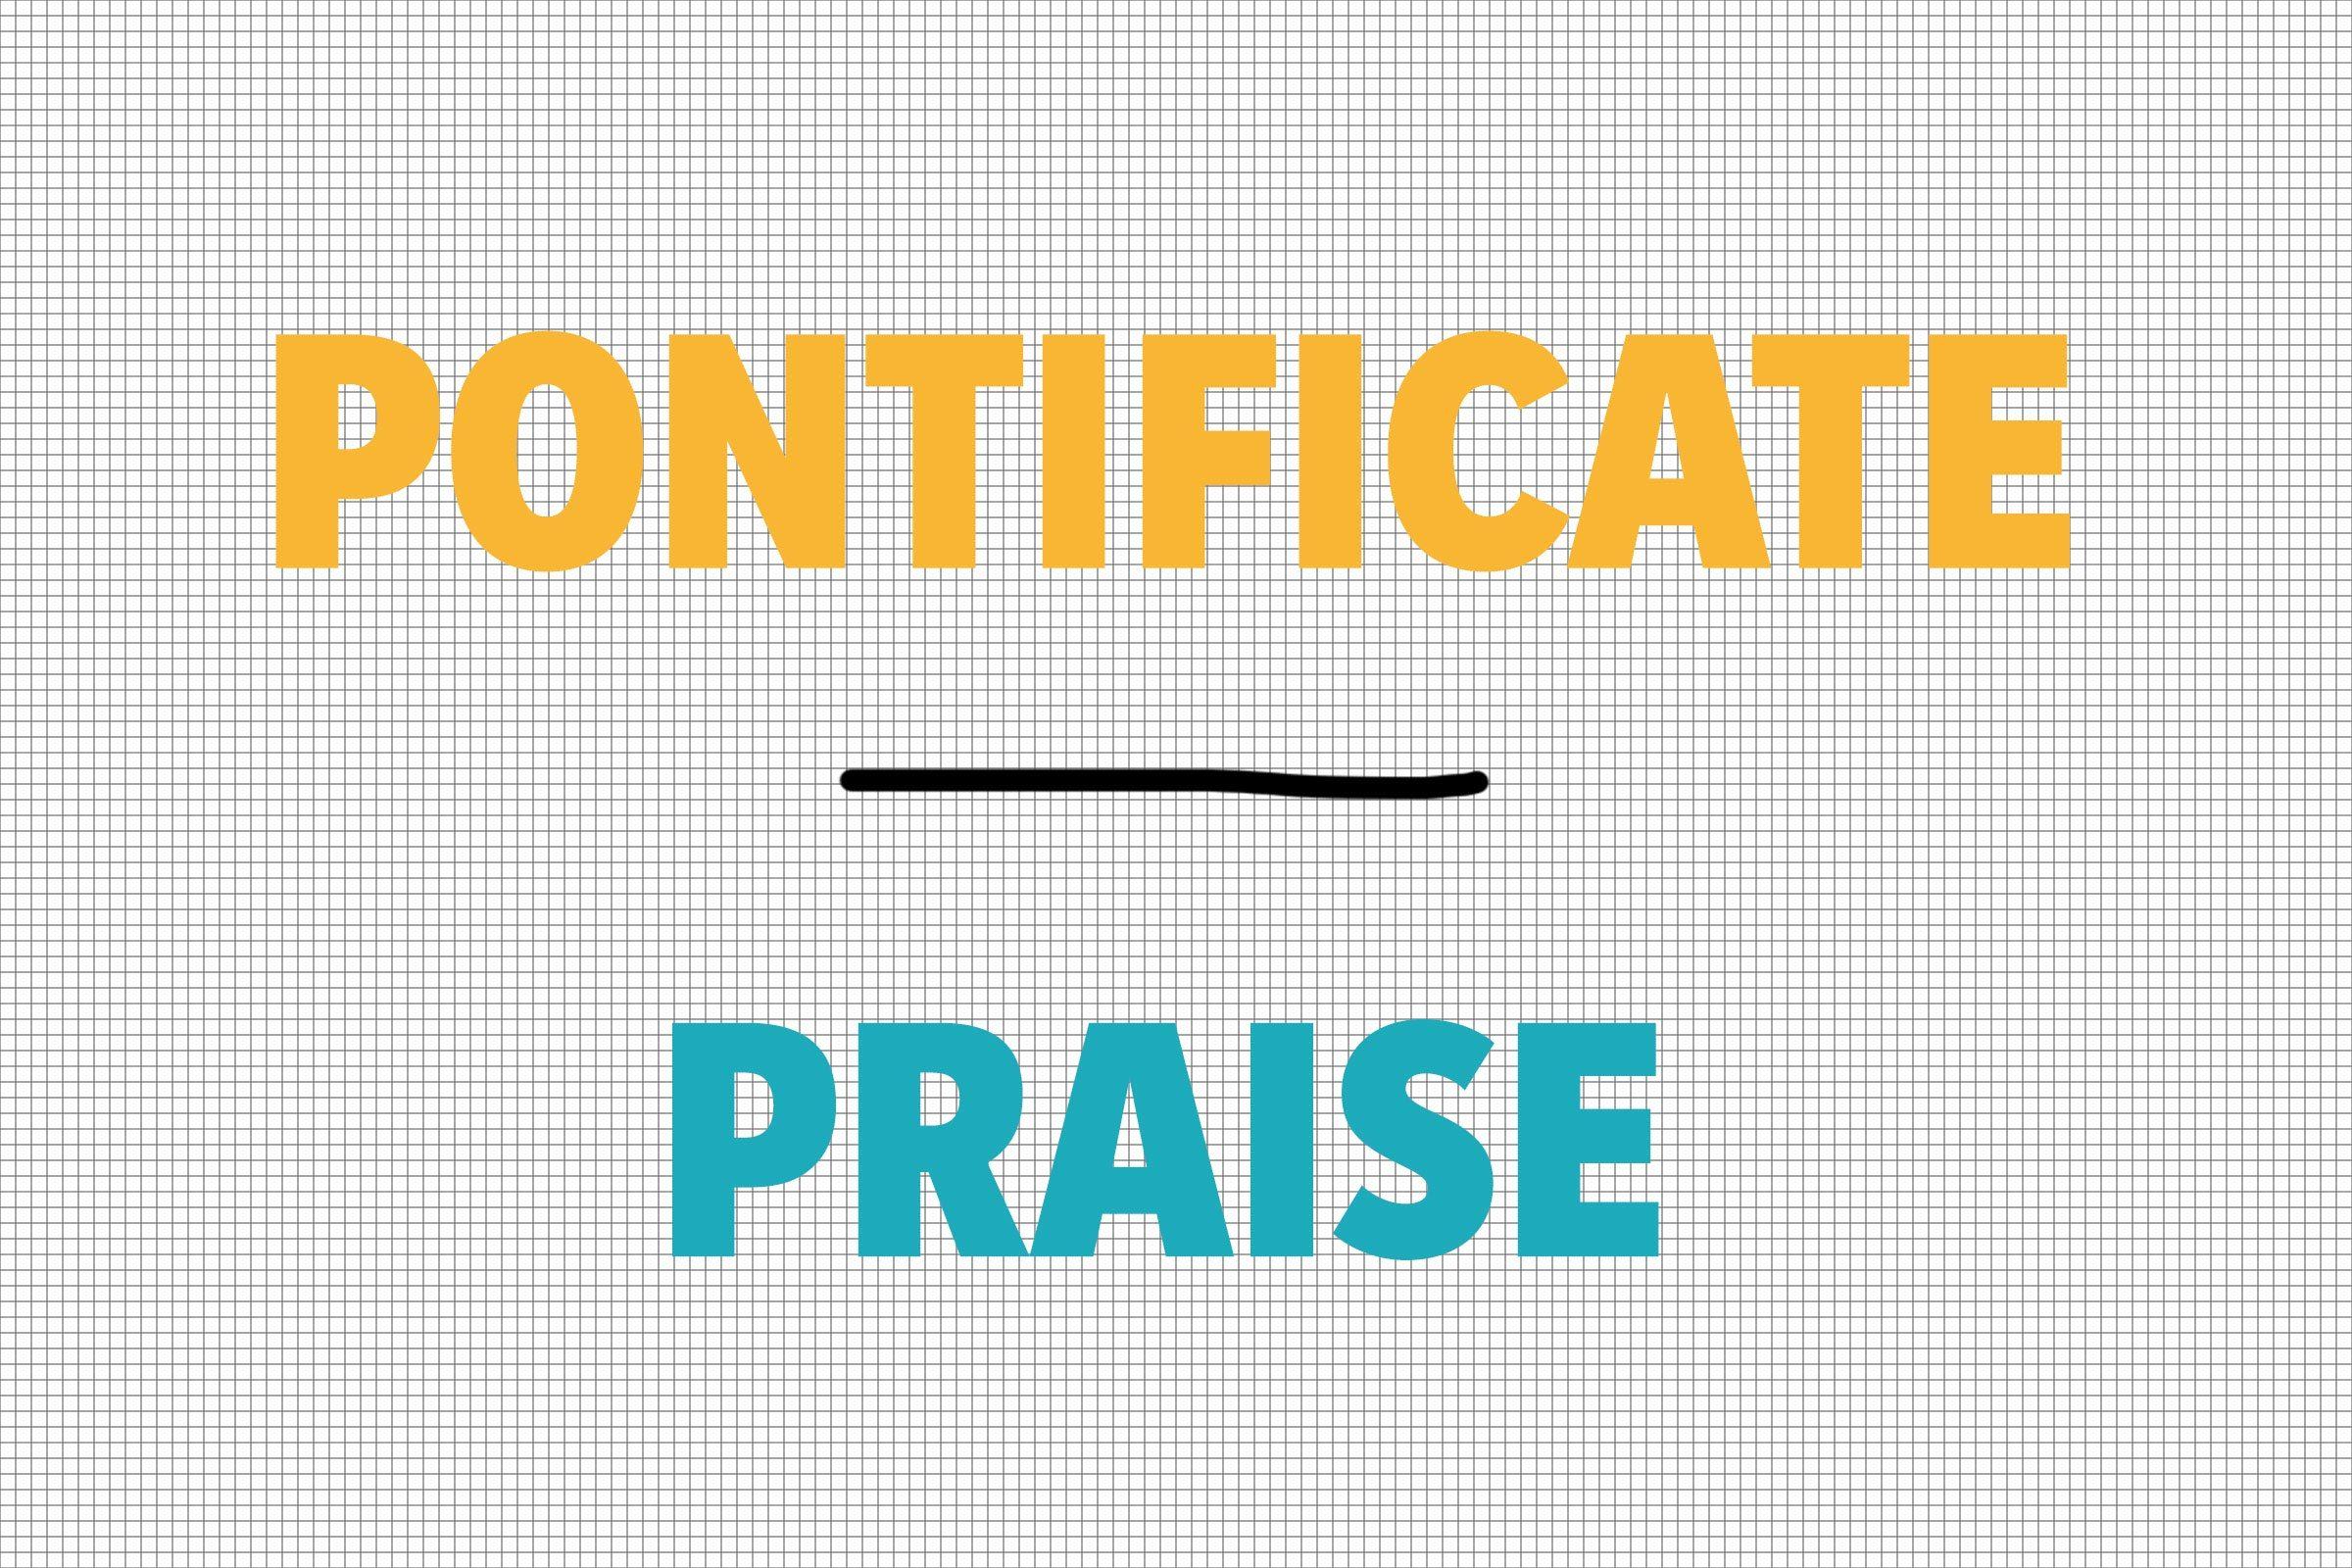 Pontificate/Praise